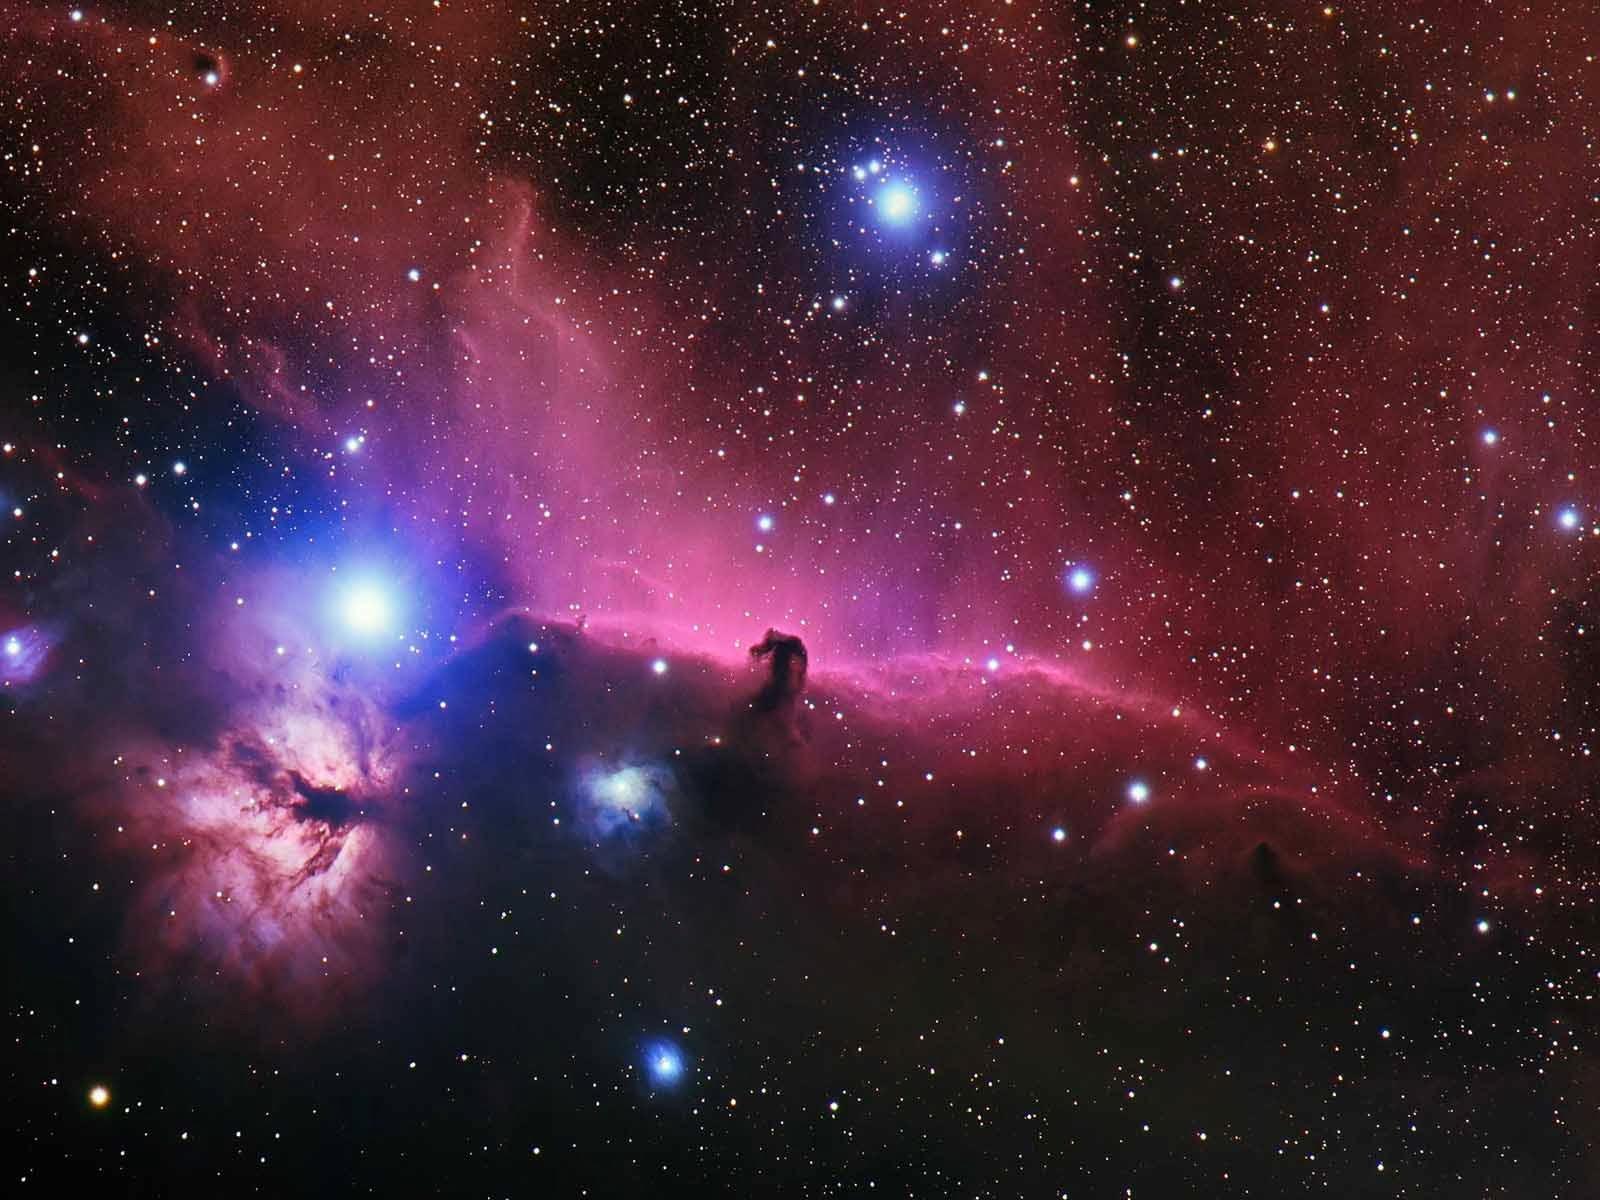 HD Wallpapers: Horsehead Nebula Wallpapers